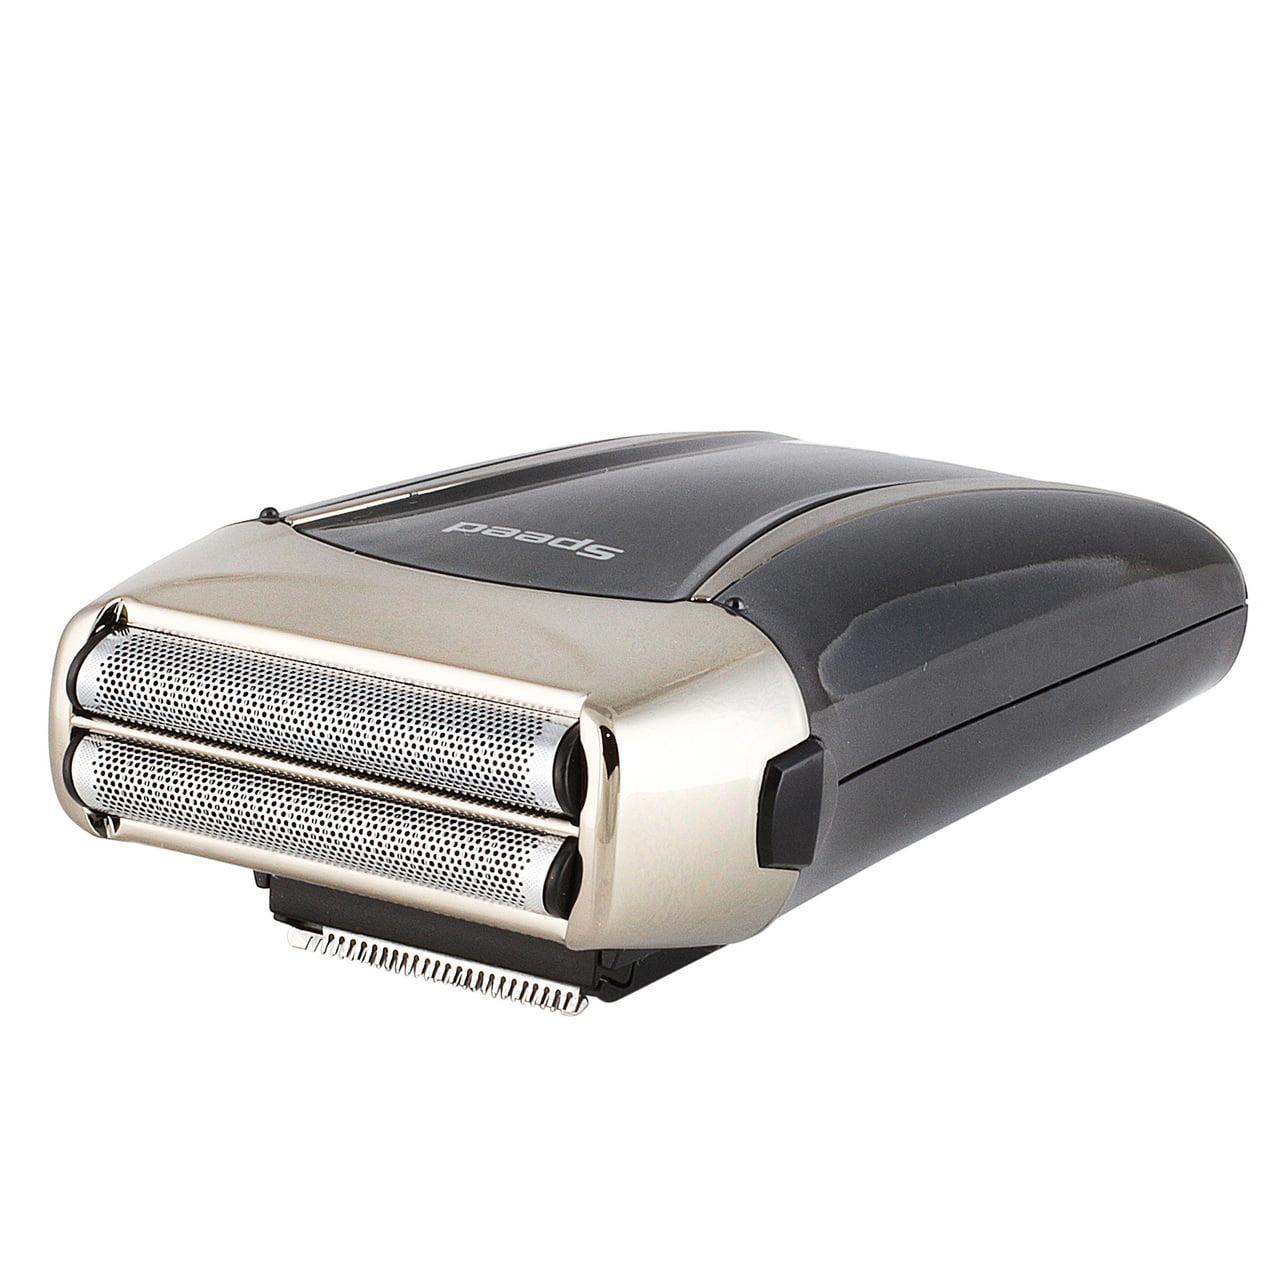 JTrim Speed 2 Elite Travel Electric Shaver For Men Flex 2 Blades Foil Electric